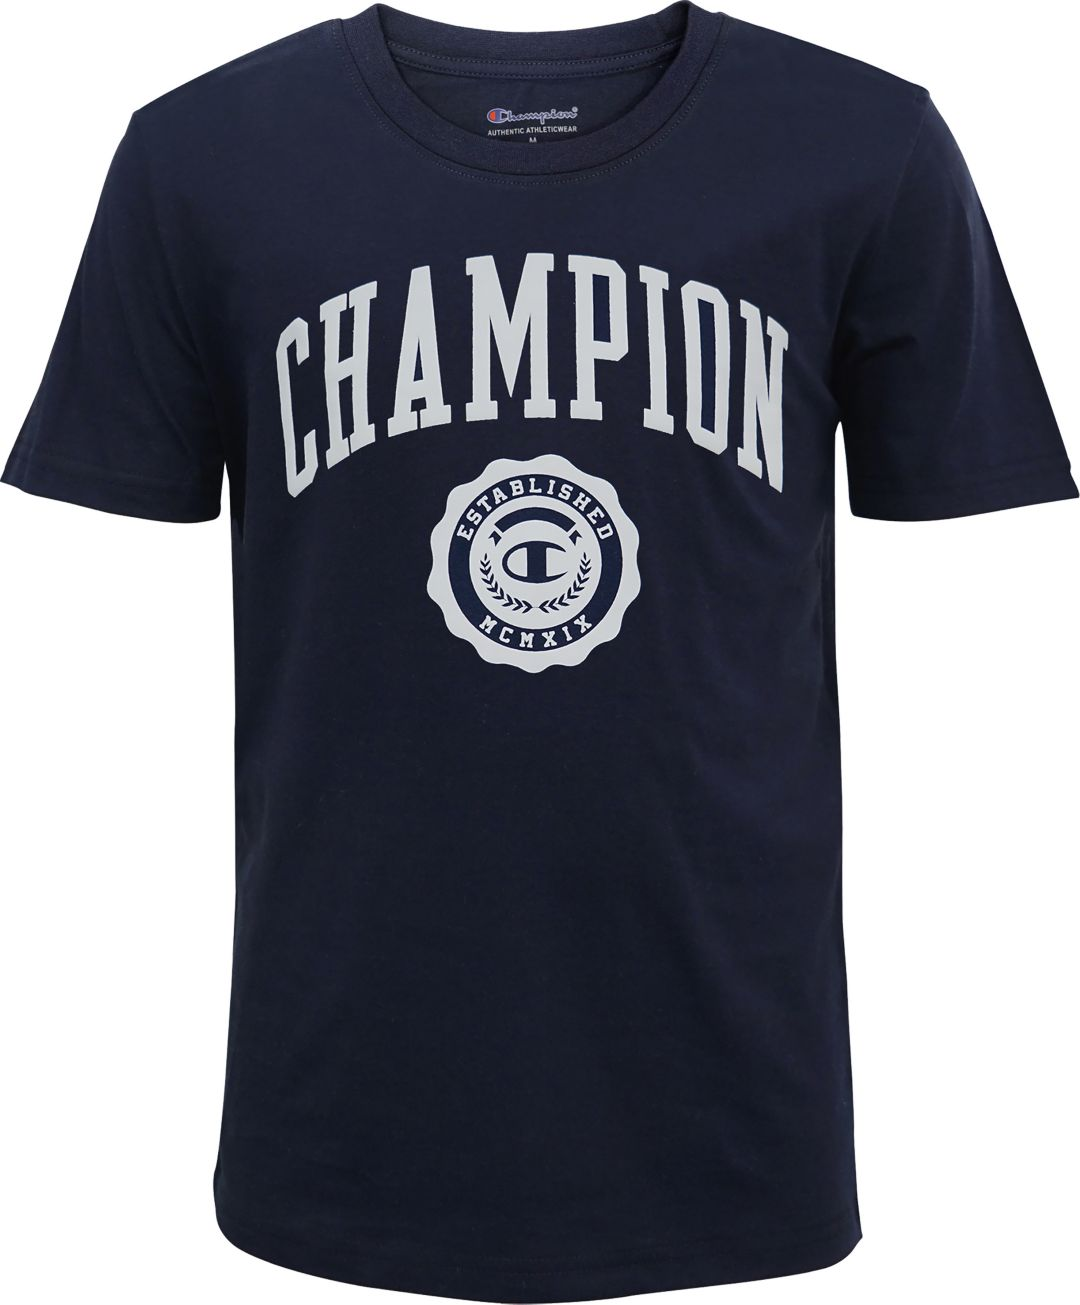 ba098f7d Champion Boys' Graphic T-Shirt   DICK'S Sporting Goods